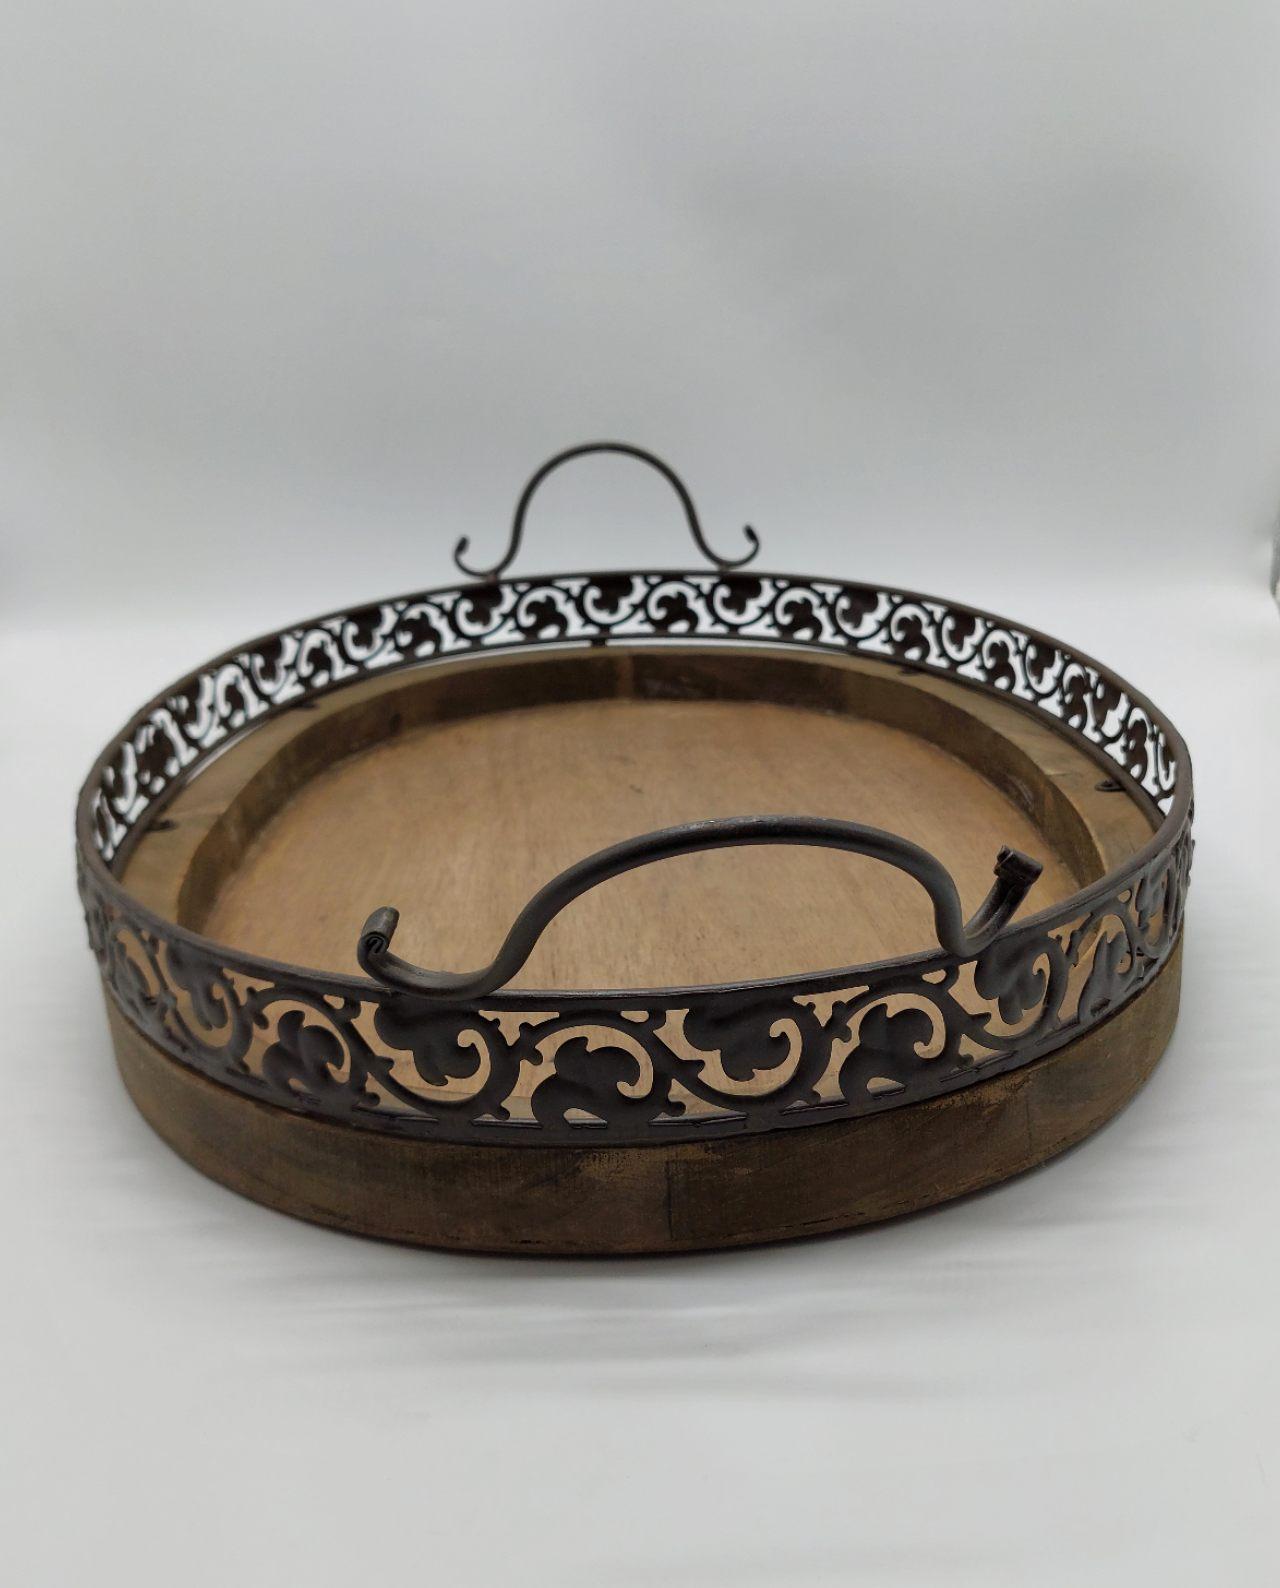 Tray Brown Wooden Metal 56 cm x 40 cm